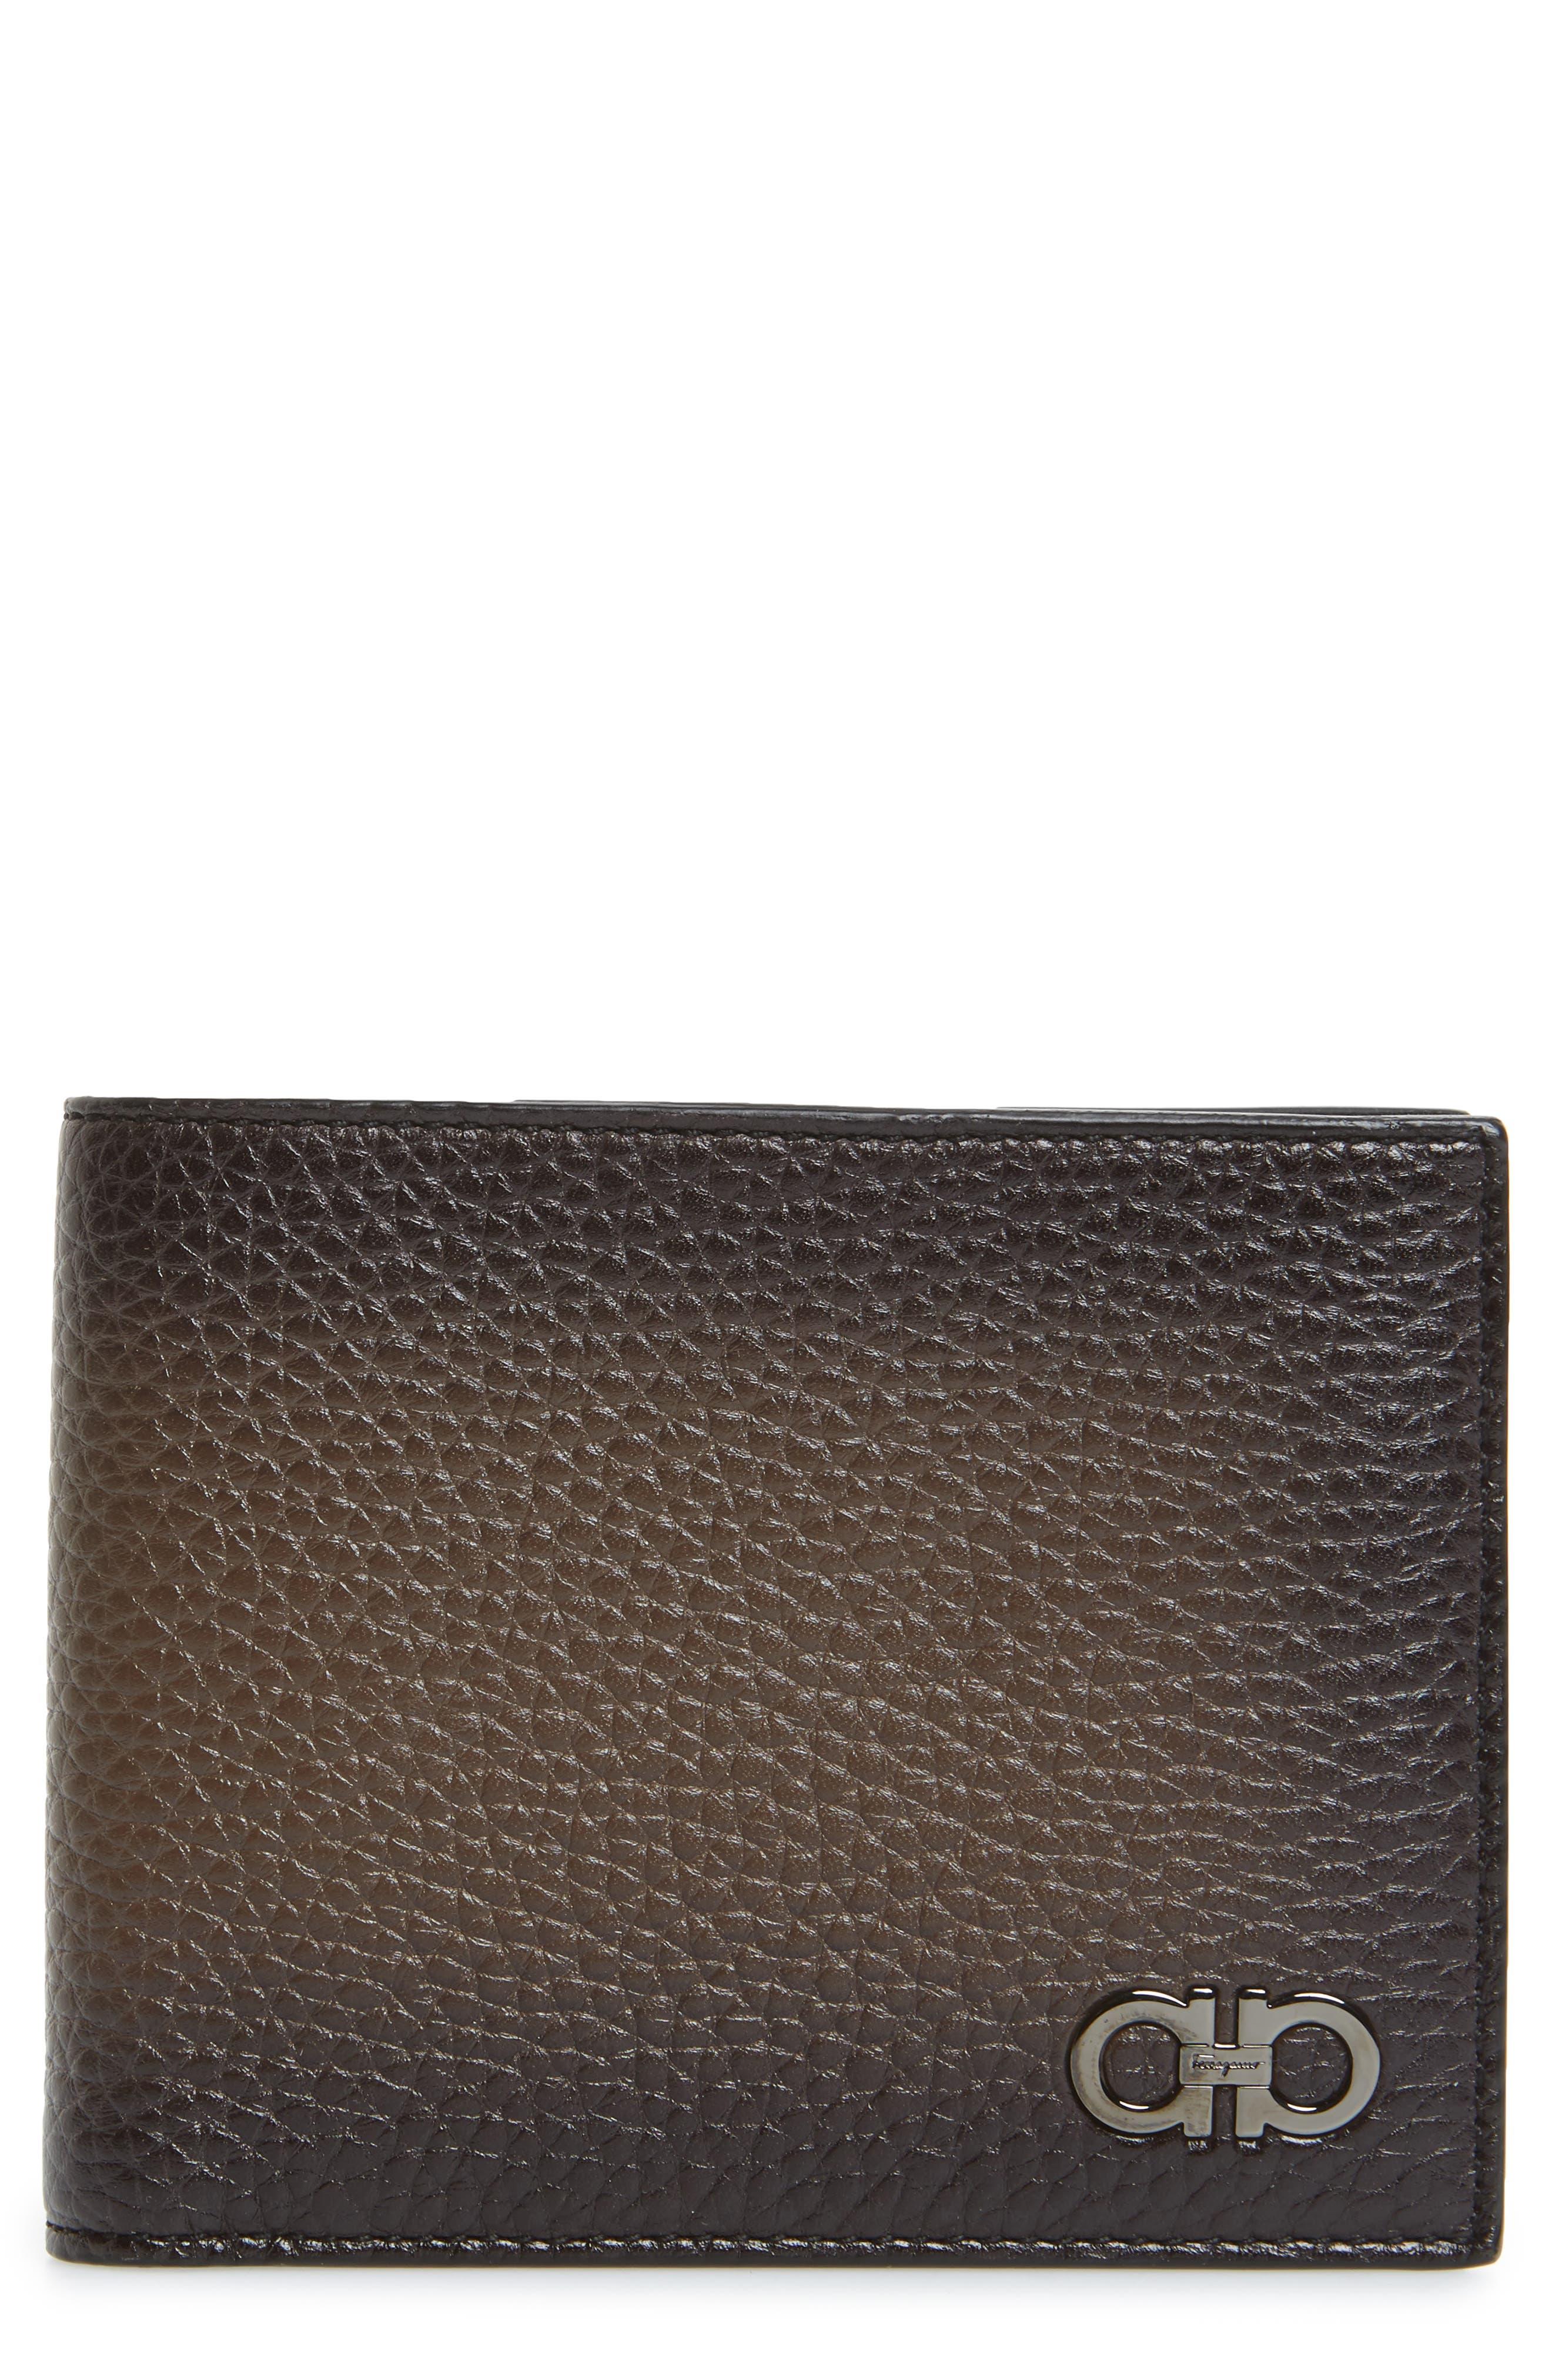 Main Image - Salvatore Ferragamo Glow Leather Wallet